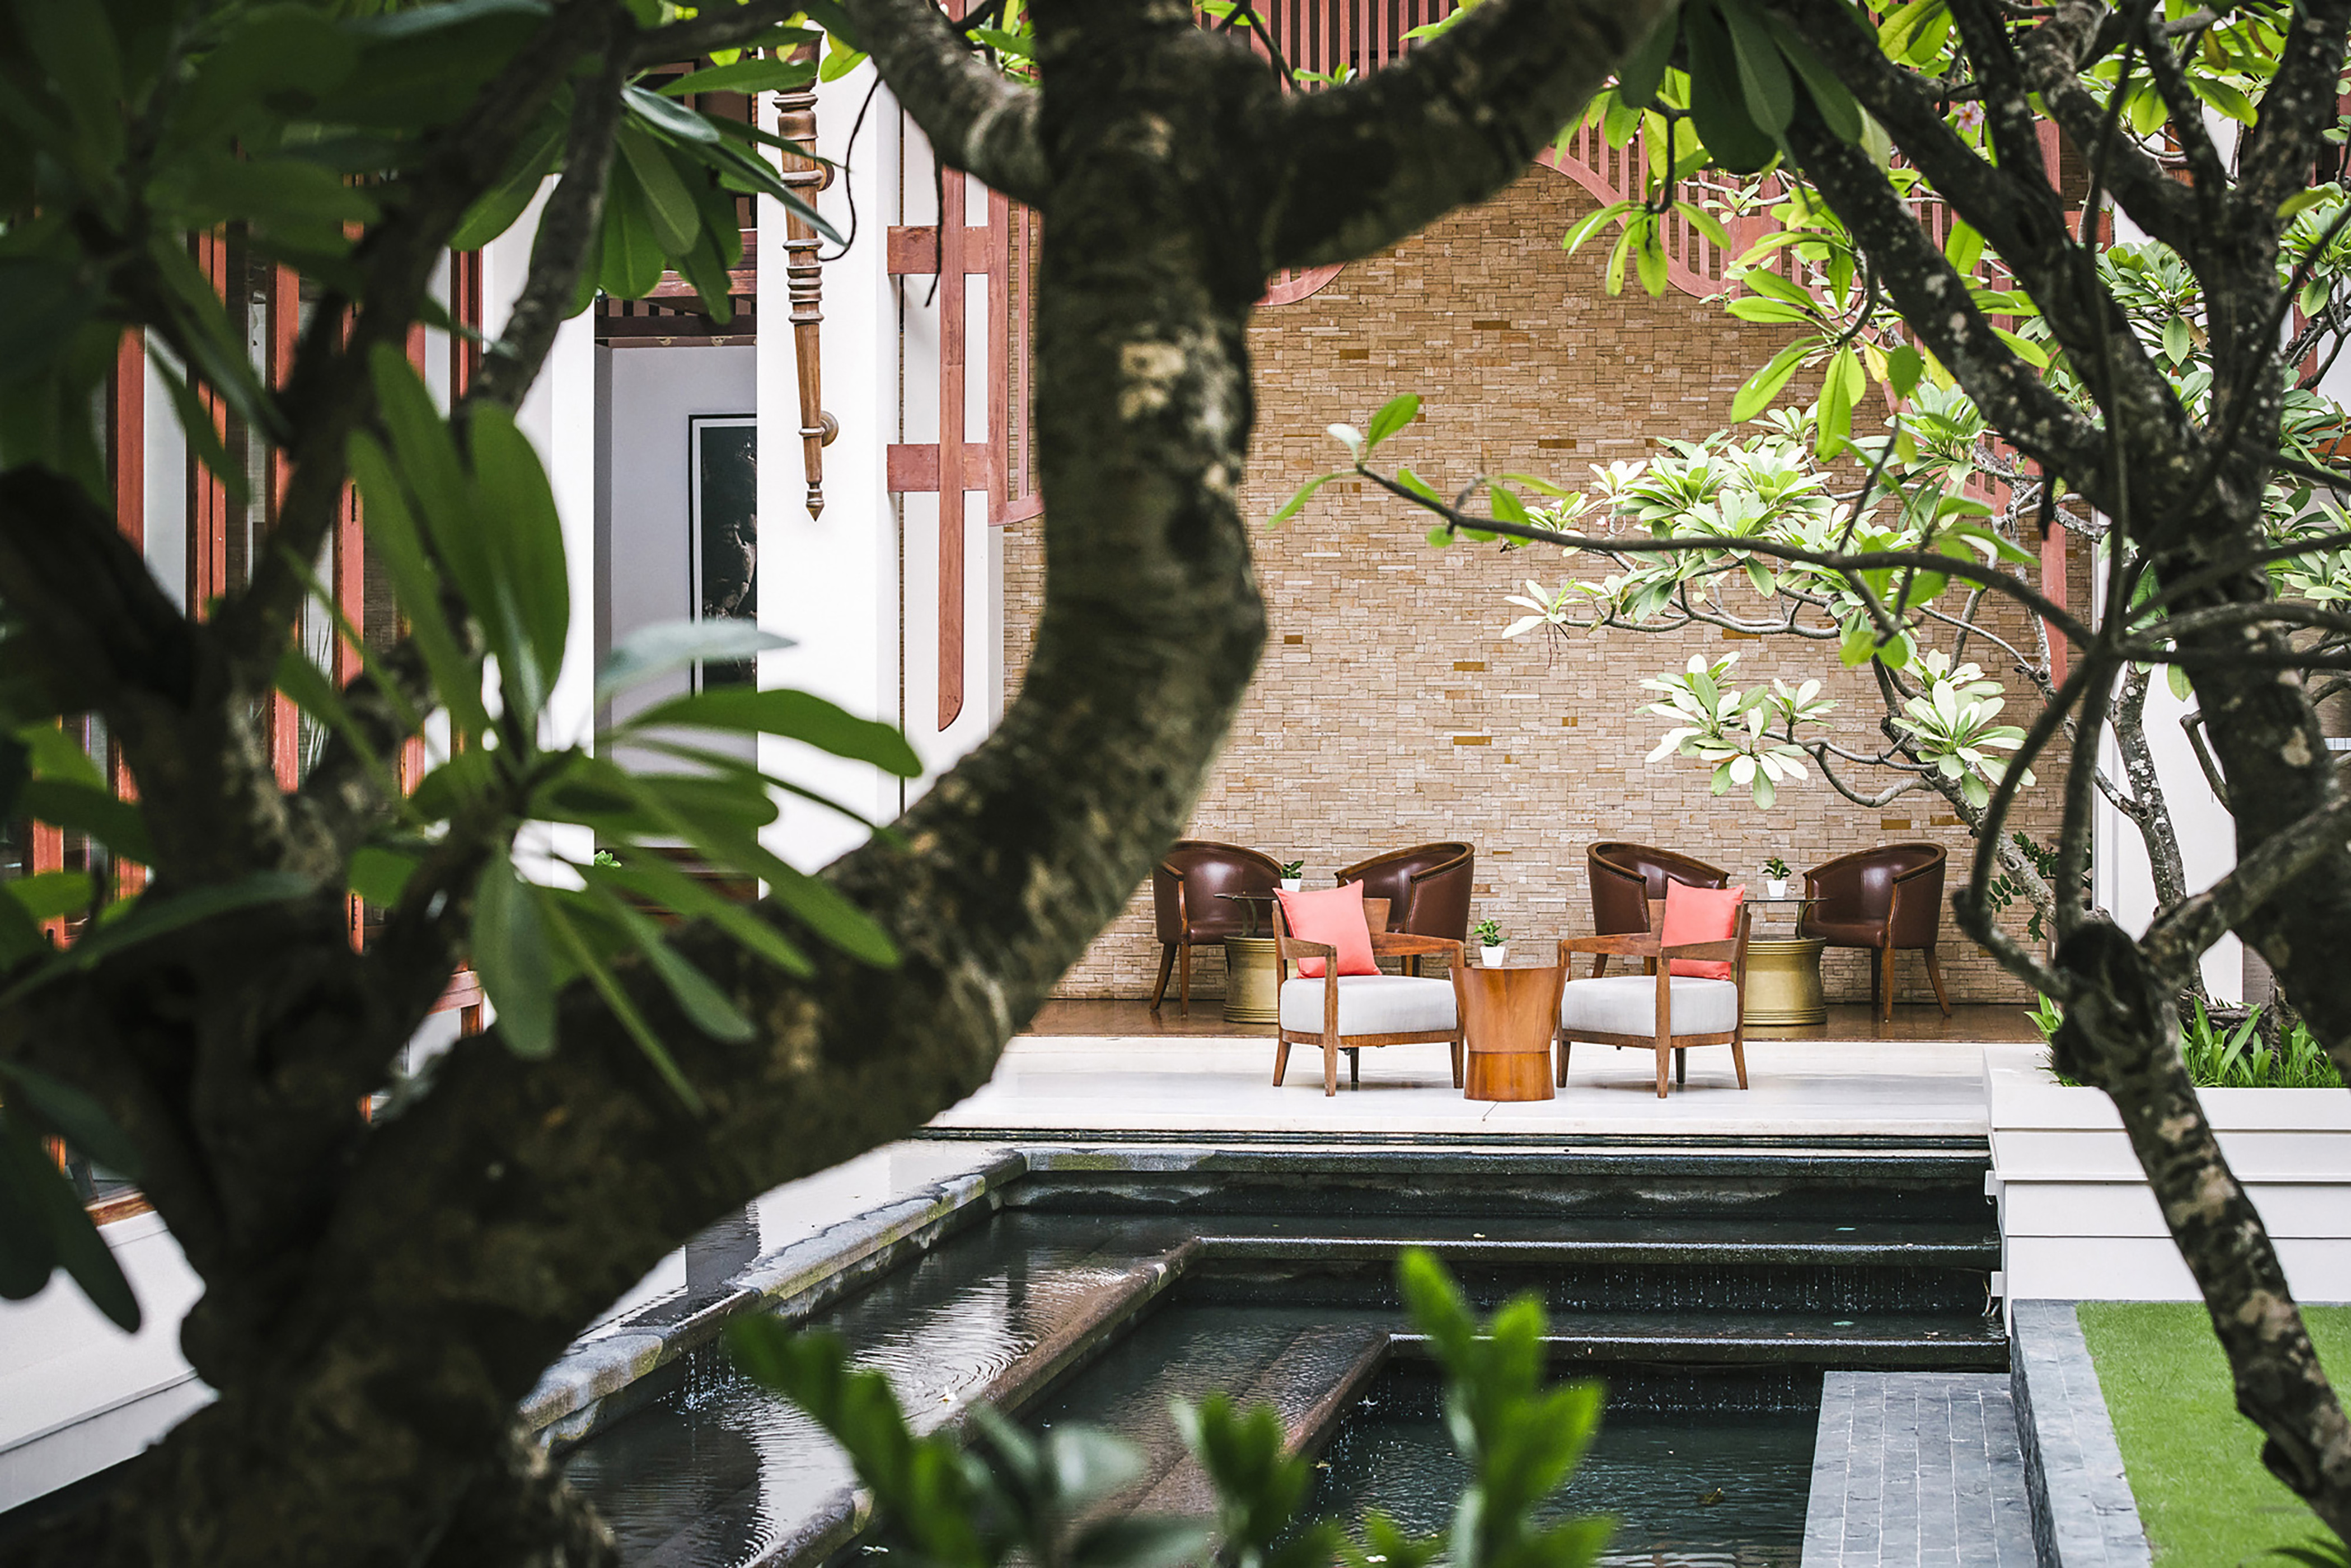 Anantara Angkor Resort Siem Reap Cambodia